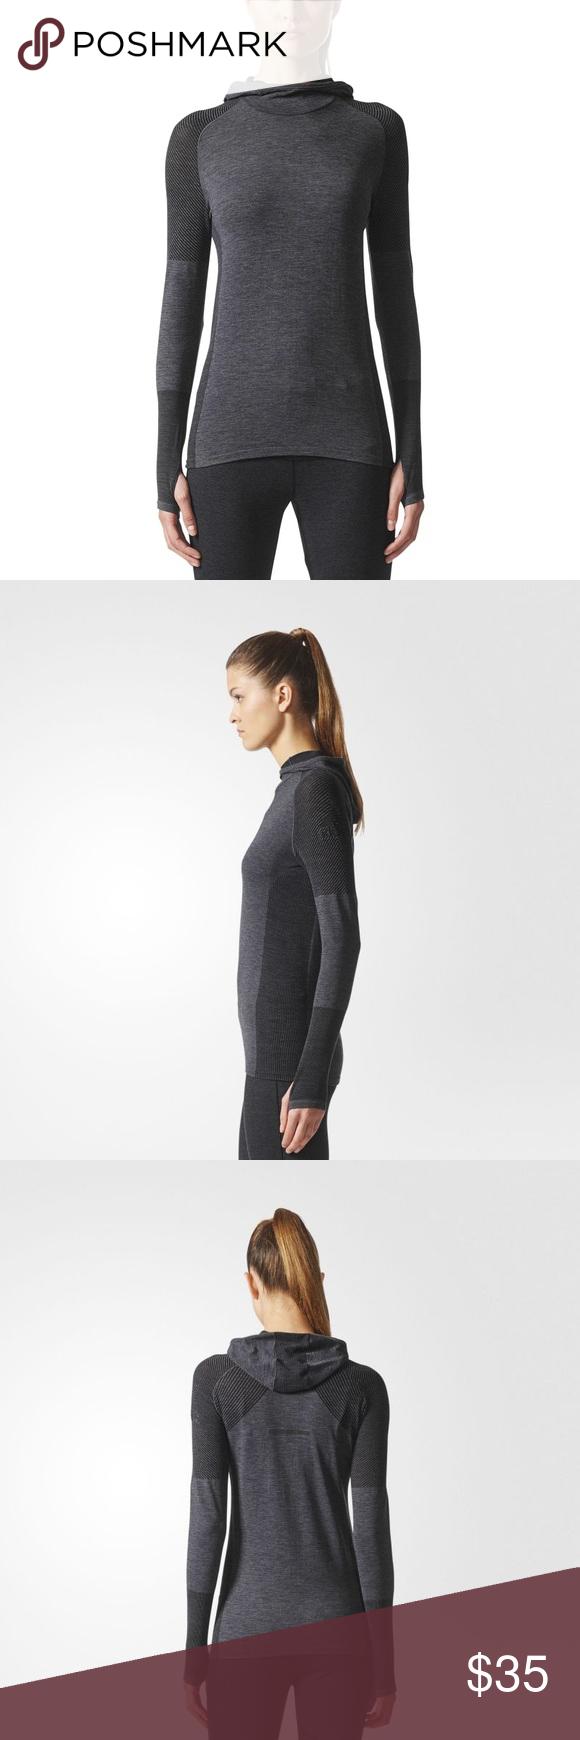 Women S Adidas Climaheat Long Sleeve Hoodie Adidas Women Long Sleeve Hoodie Clothes Design [ 1740 x 580 Pixel ]